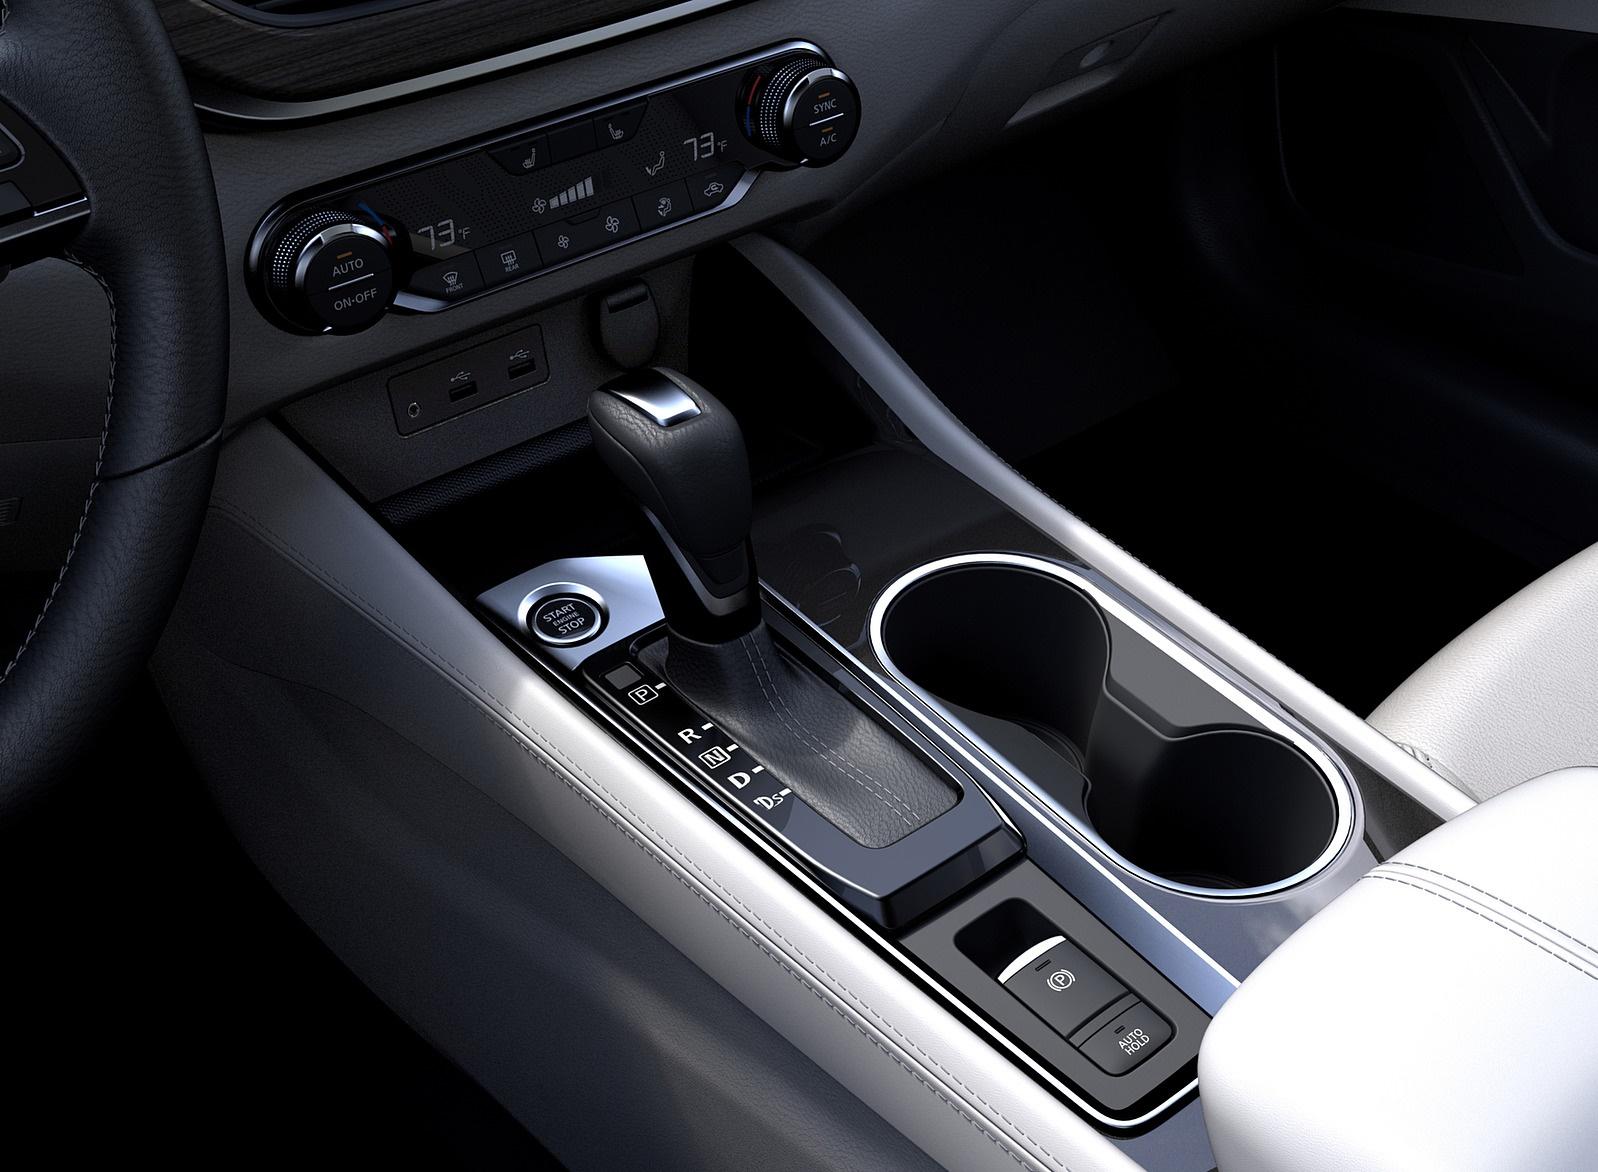 2019 Nissan Altima Interior Detail Wallpaper (15)